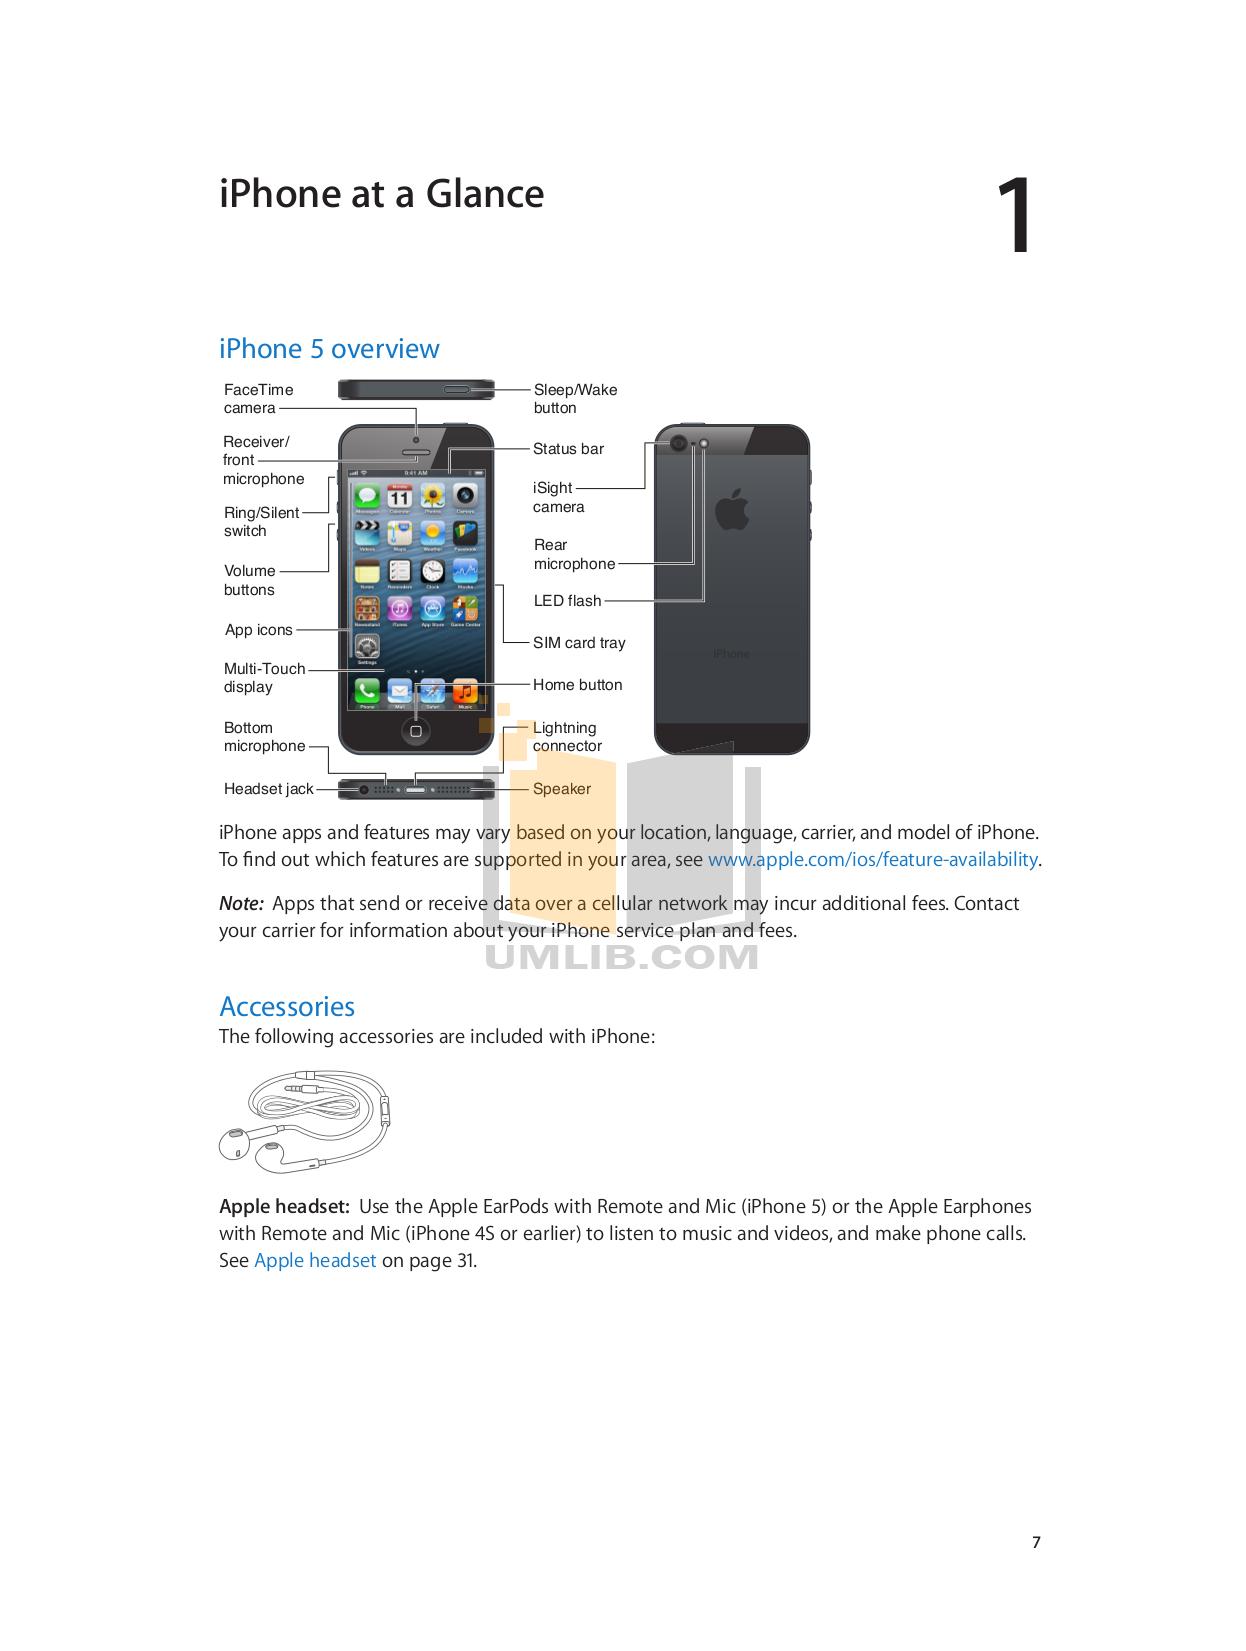 apple verizon iphone user guide professional user manual ebooks u2022 rh gogradresumes com Apple iPhone Cases iPhone iOS 6 User Guide